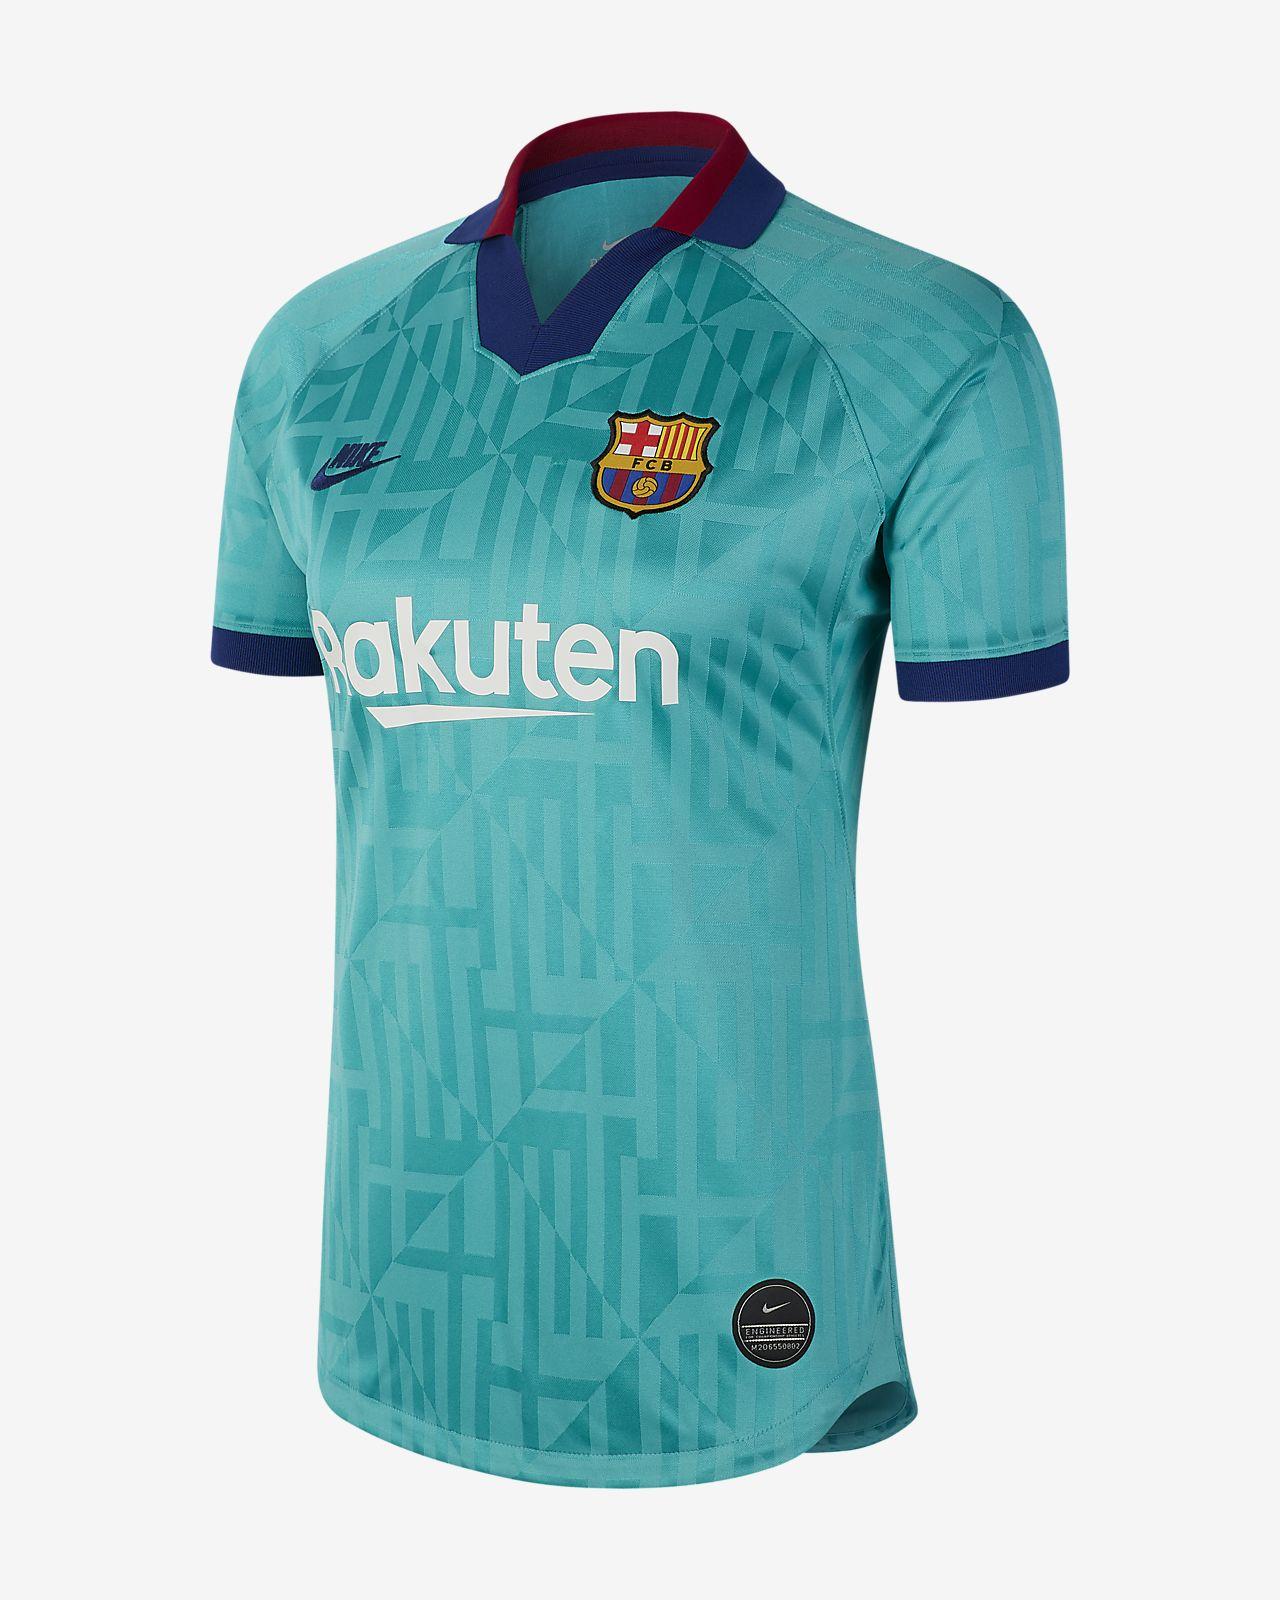 Maglia da calcio FC Barcelona 2019/20 Stadium Third - Donna